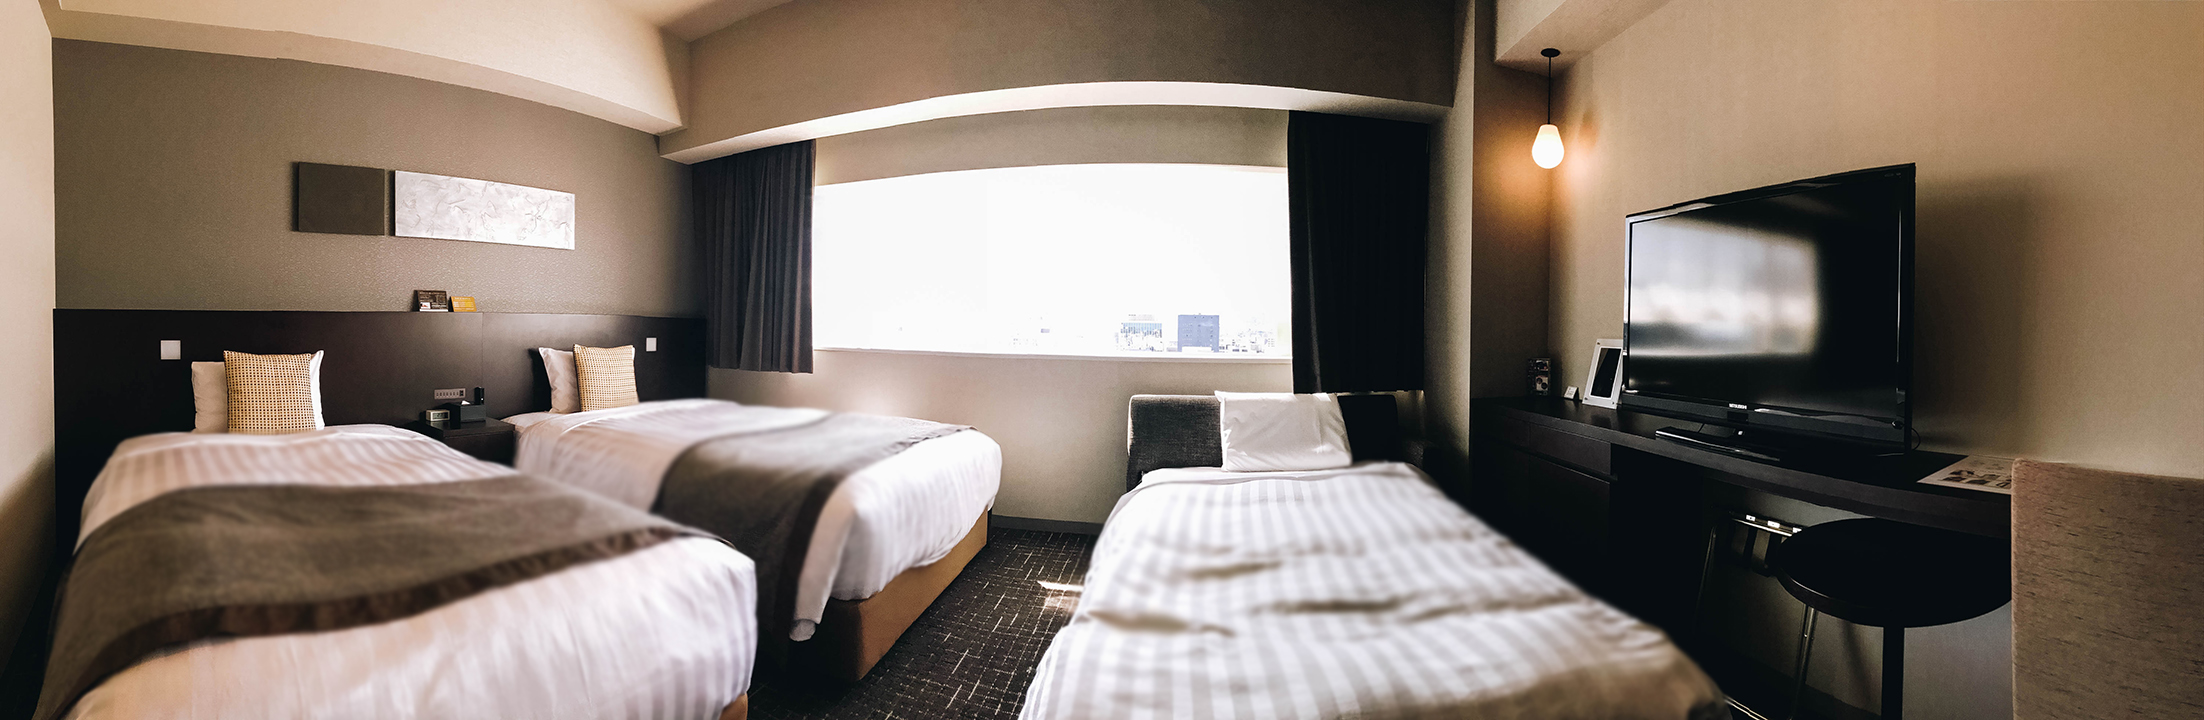 Triple Room at Hiroshima Washington Hotel